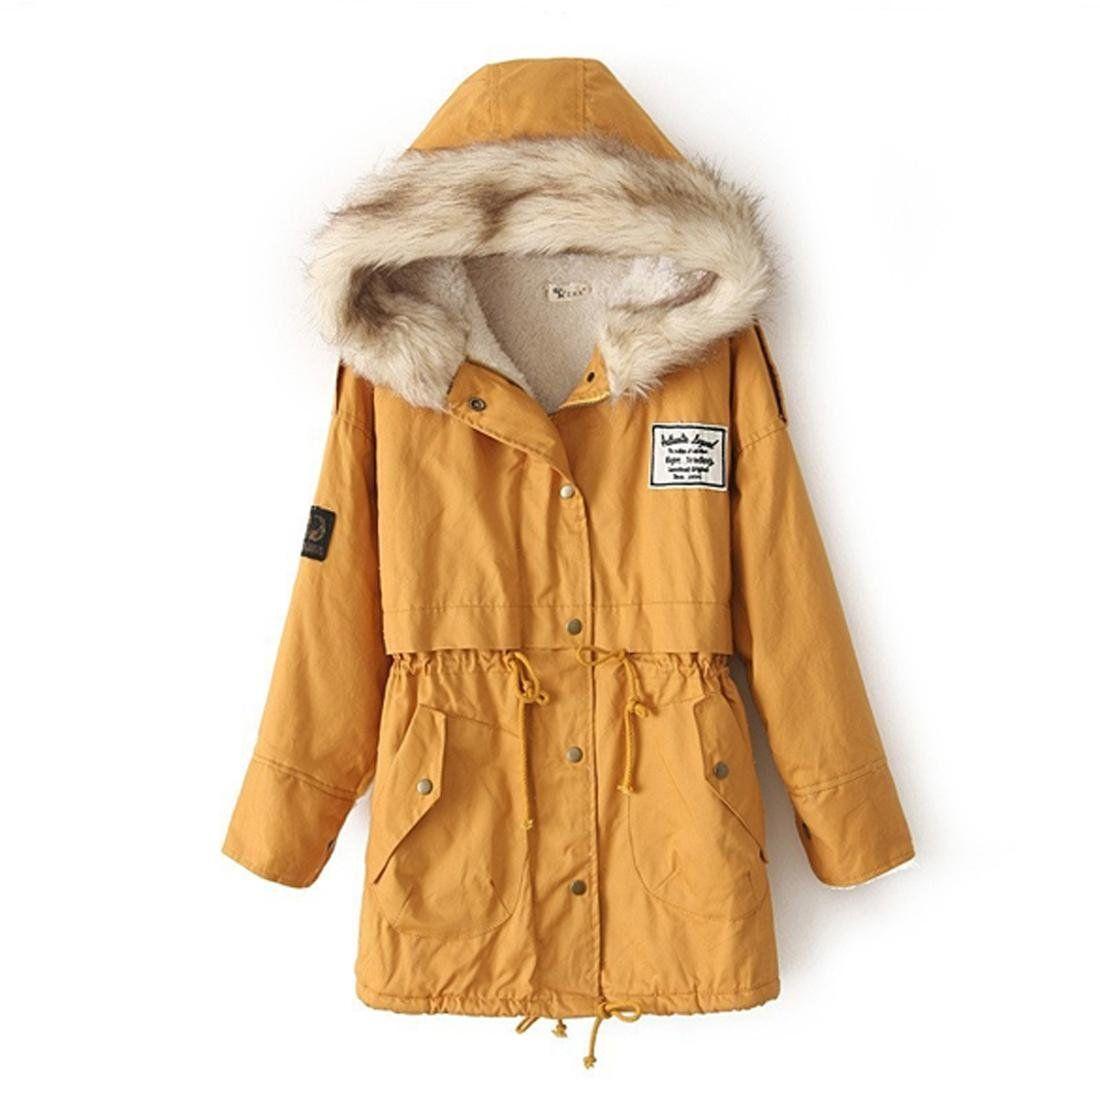 Zeagoo Damen Winter Hoodie Fleece Jacke Gepolsterte Jacke Kapuzenjacke Wintermantel Jacken Wintermantel Damen Fleece Jacke